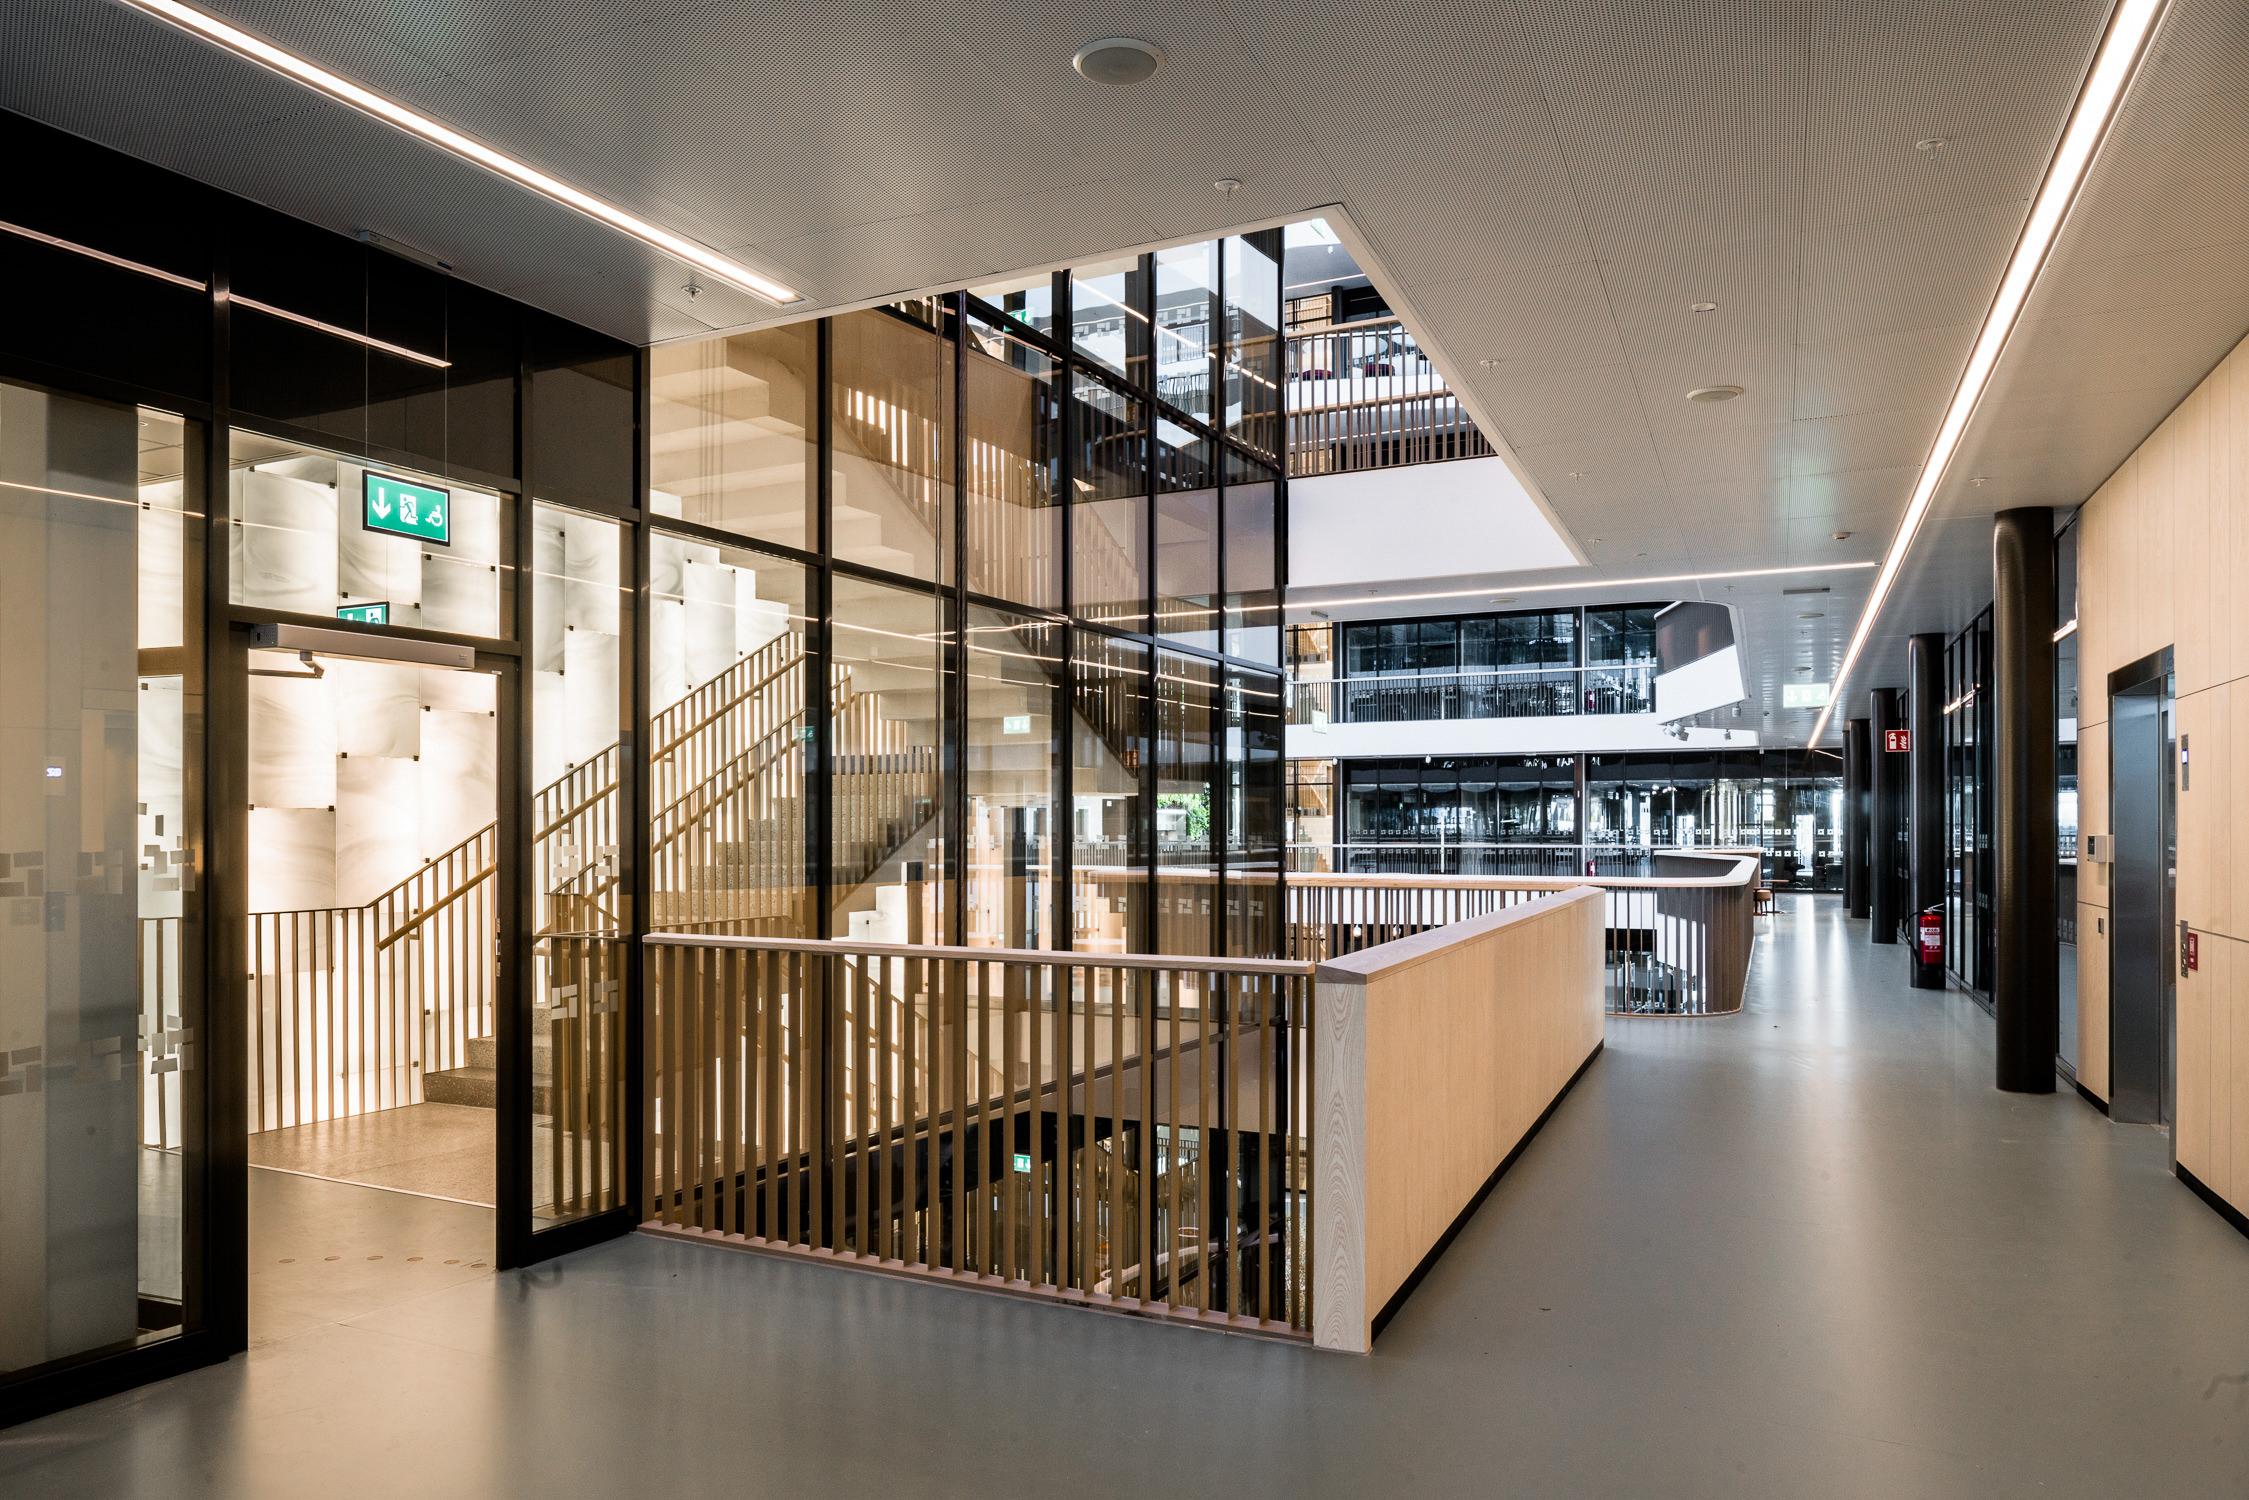 mark-hadden-architecture-photographer-london-amsterdam-Biomedicum-084.jpg